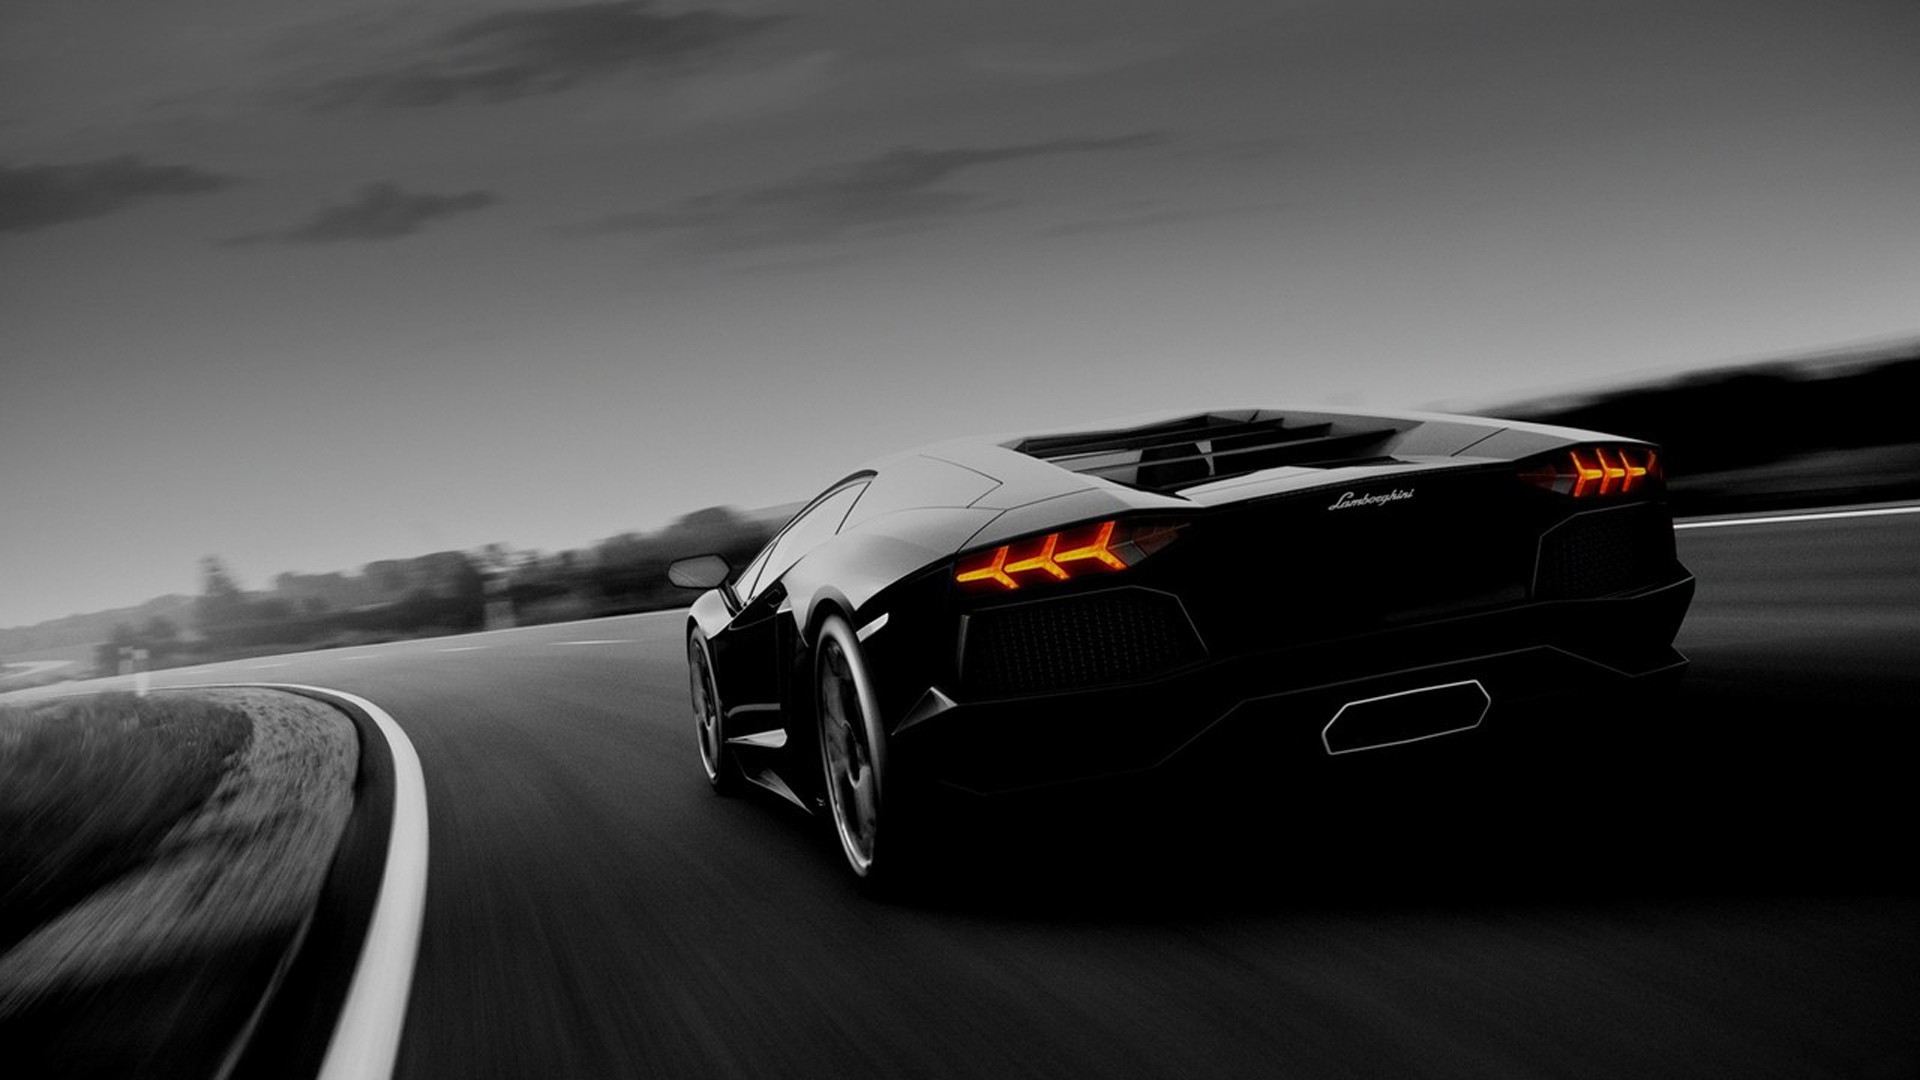 Lamborghini mursielago audi на телефон